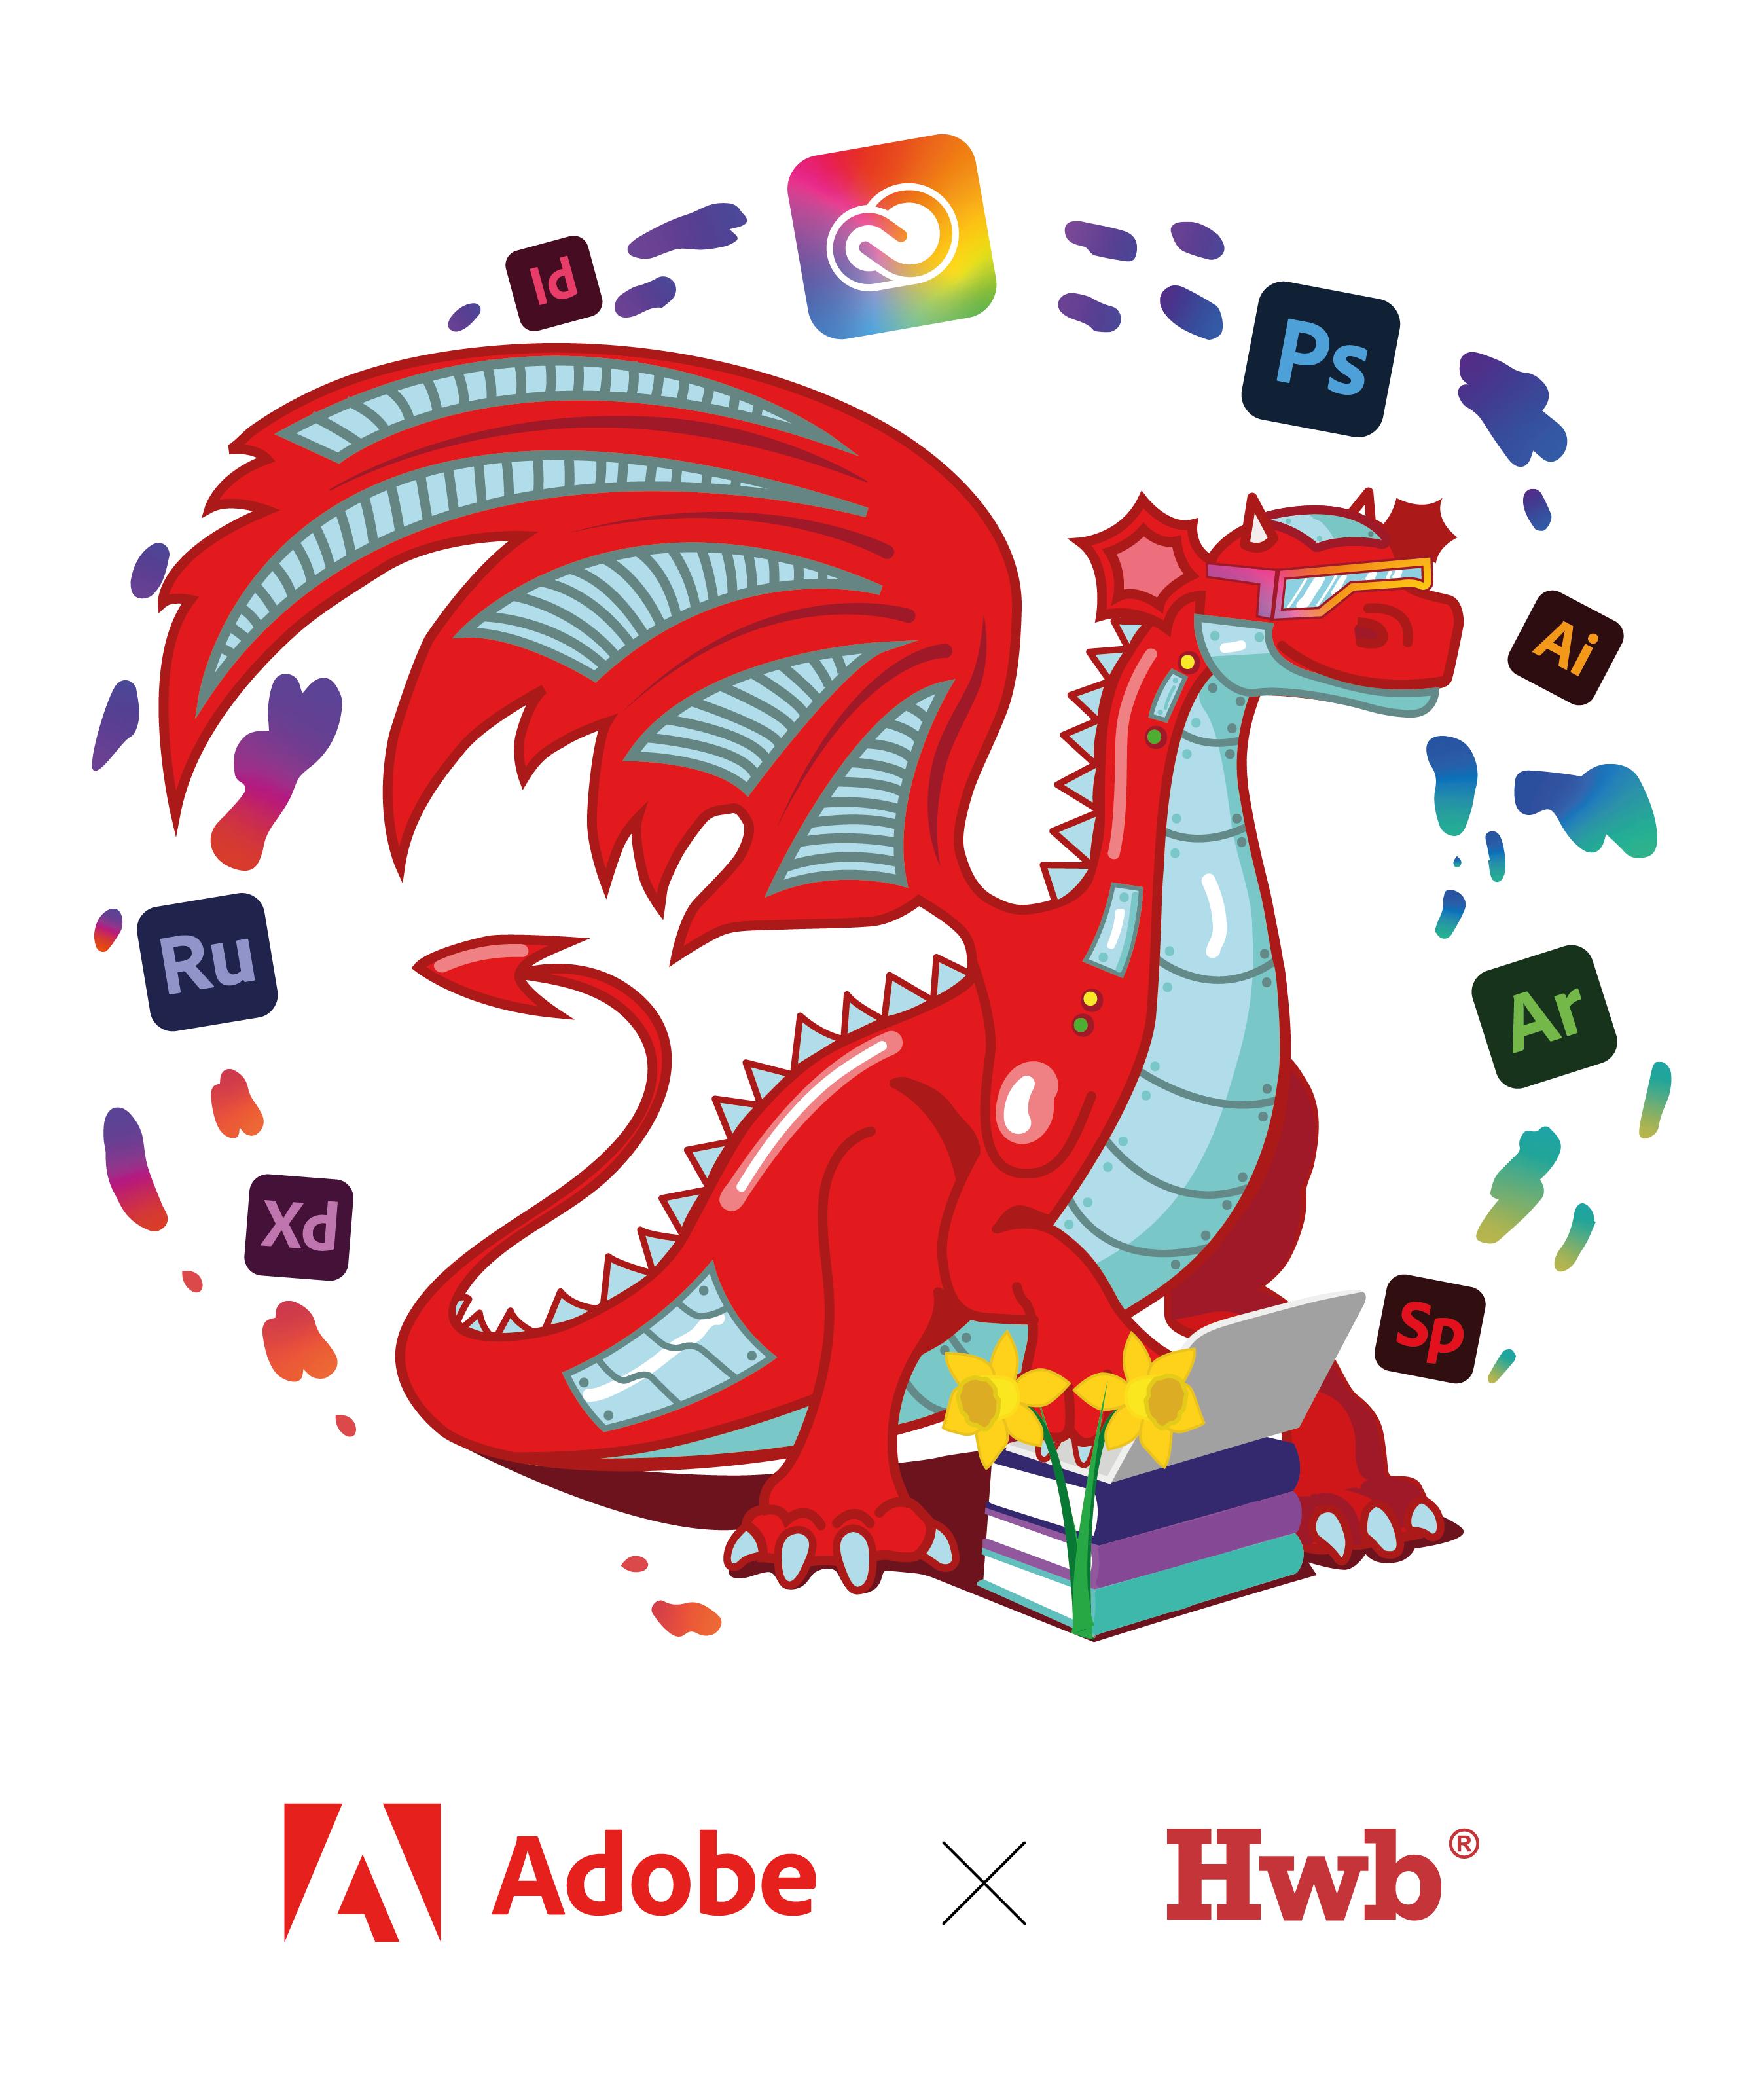 Adobe Dragon